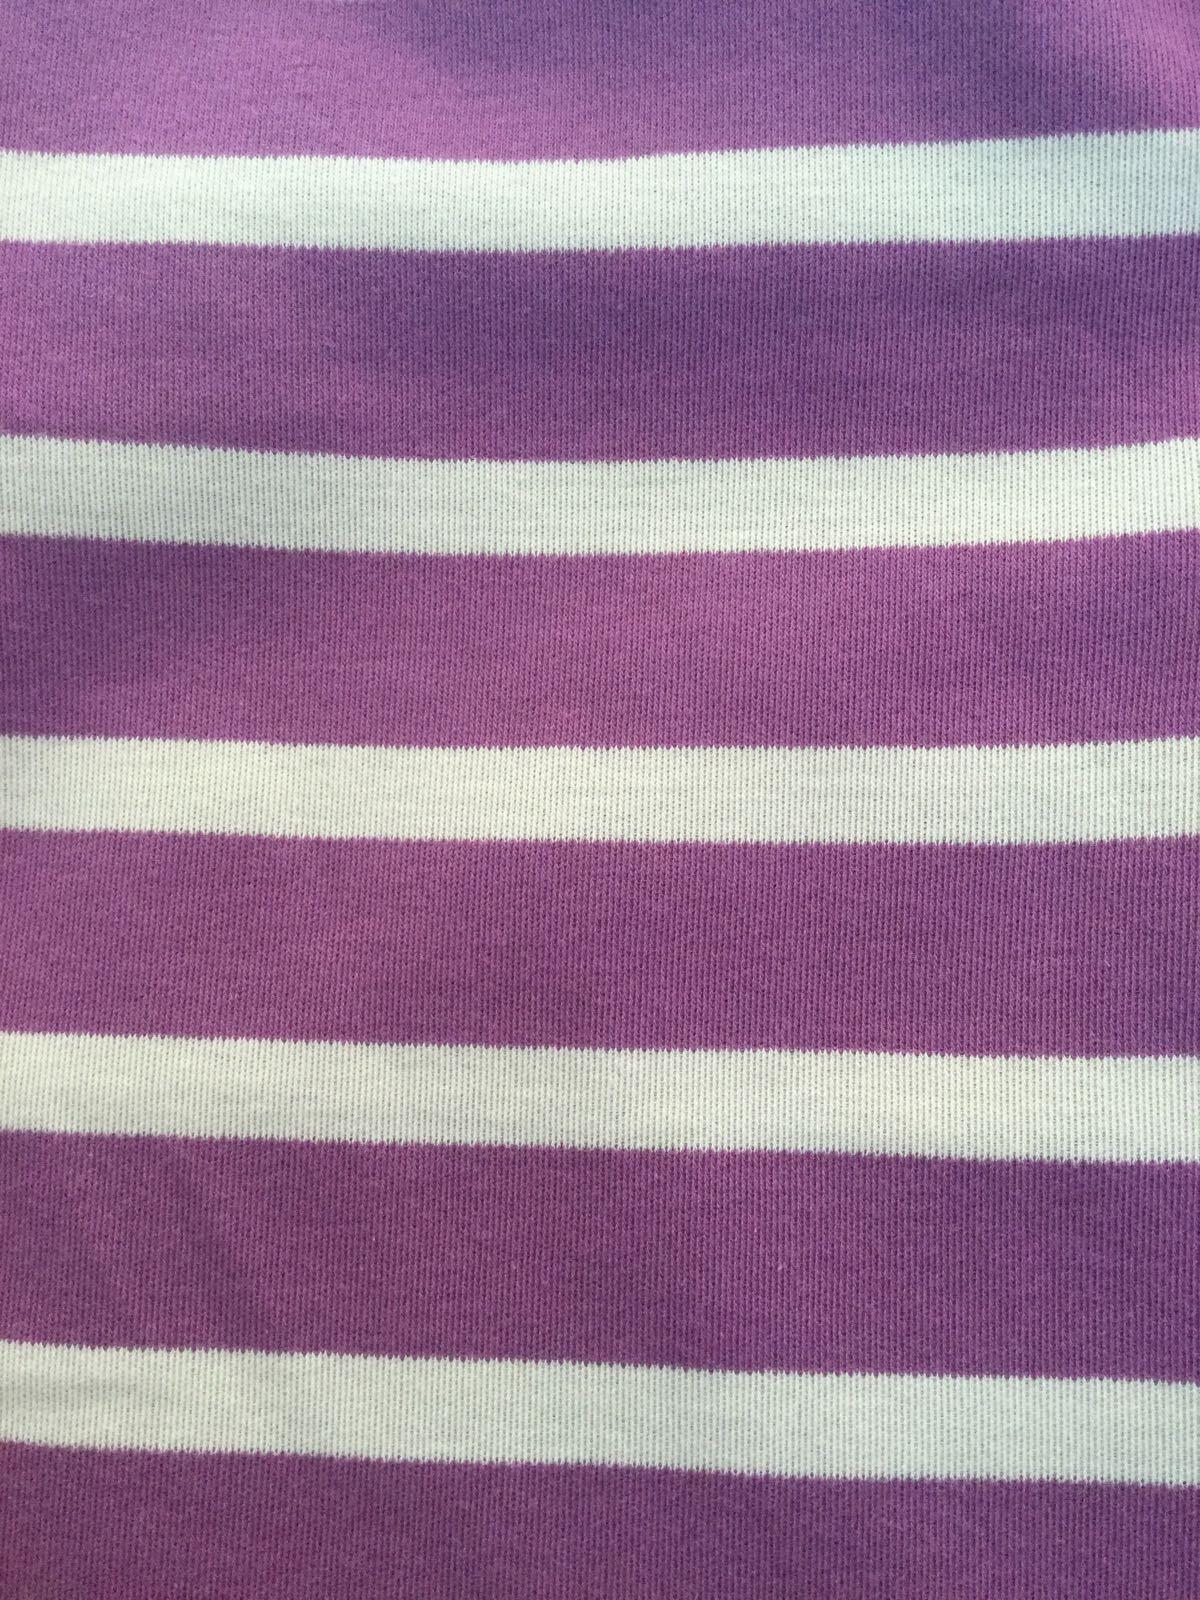 Pigeon - T-shirt (Breton stripe), purple/pumice,